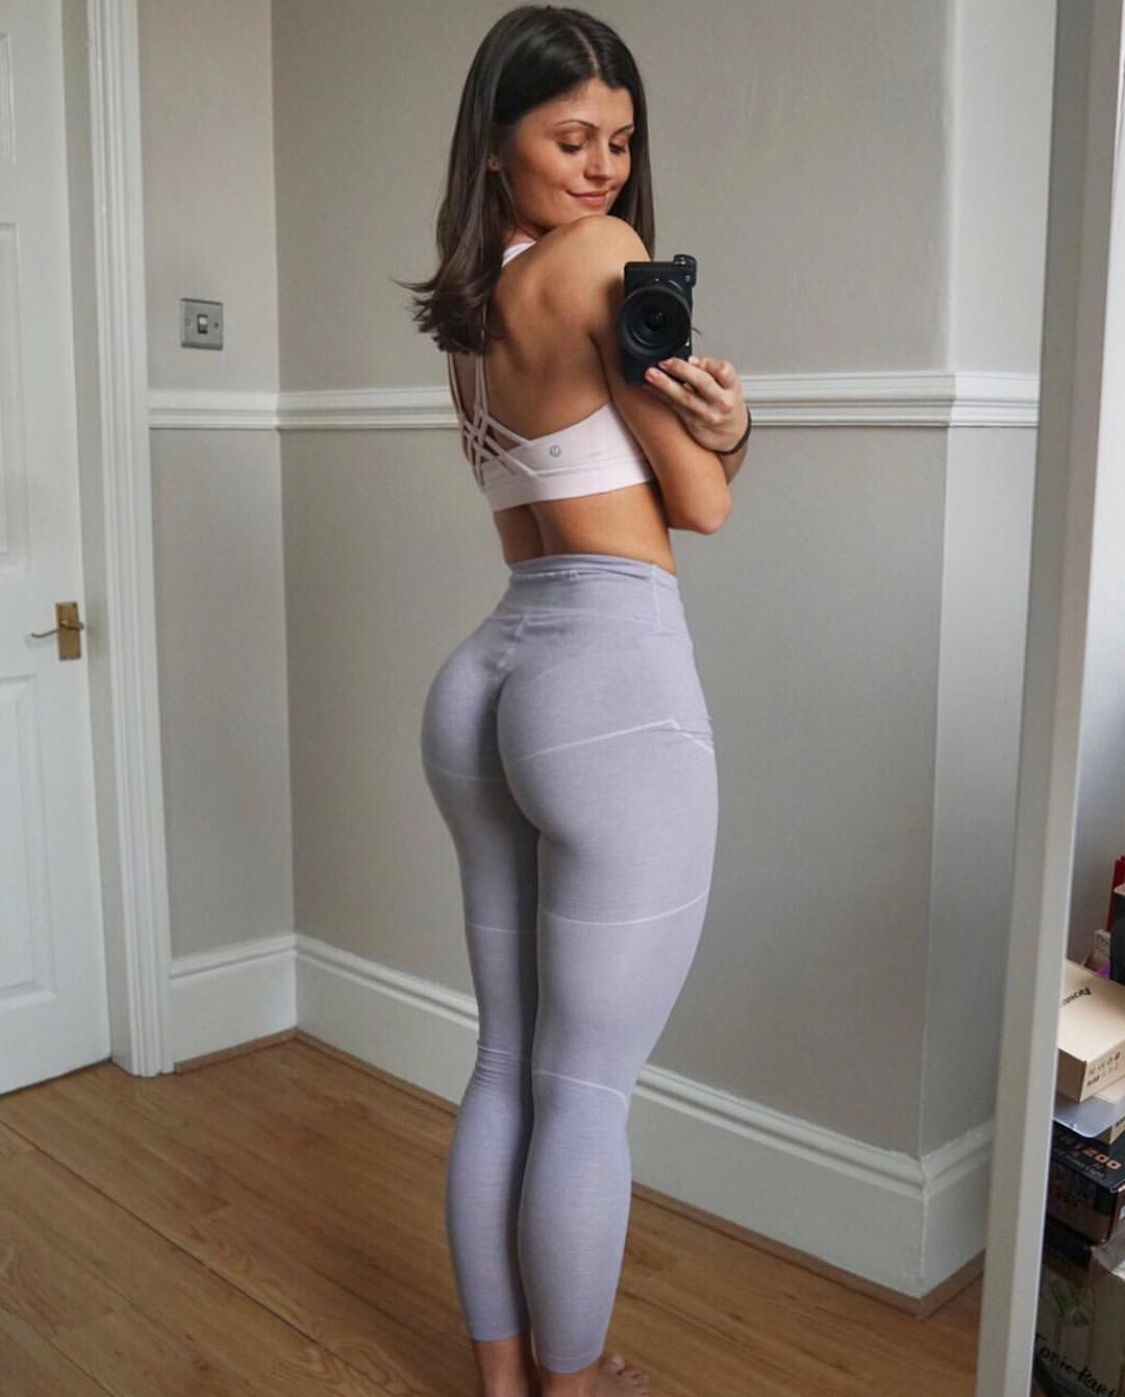 Hot Blonde Teen Yoga Pants